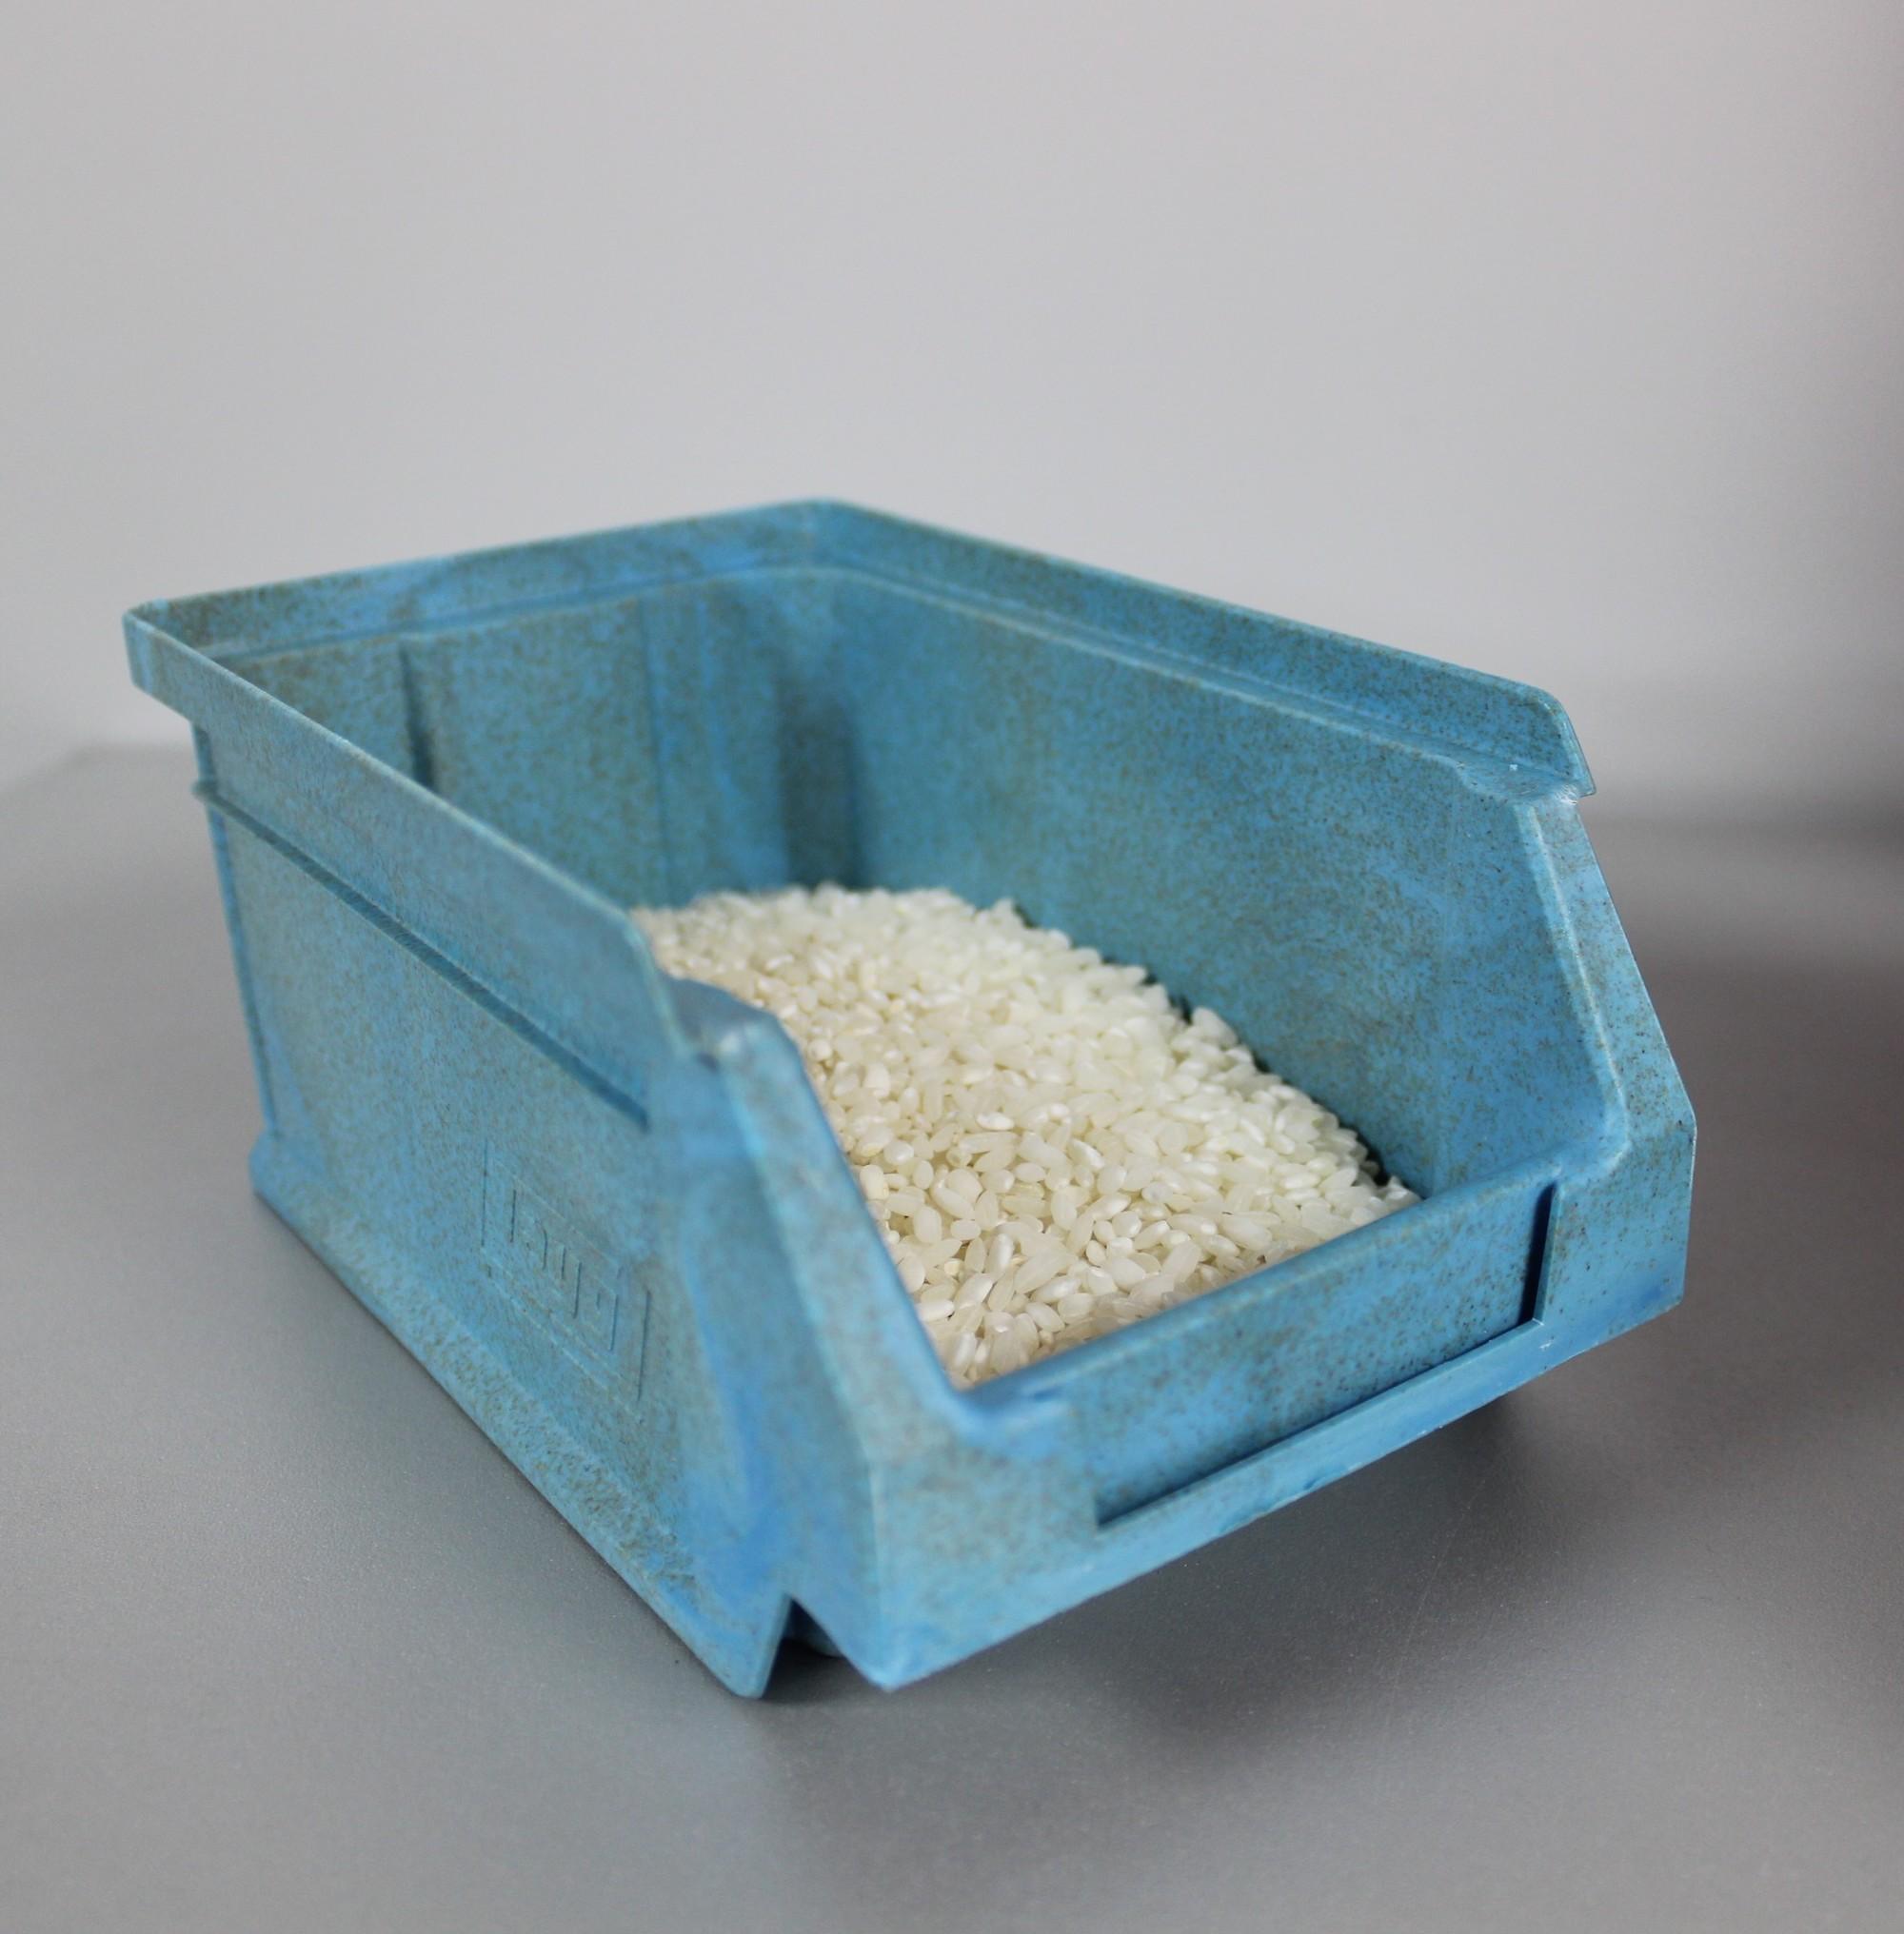 https://www.tayg.com/wp-content/uploads/2019/12/gavetas-biodegradables-tayg-natur.jpg